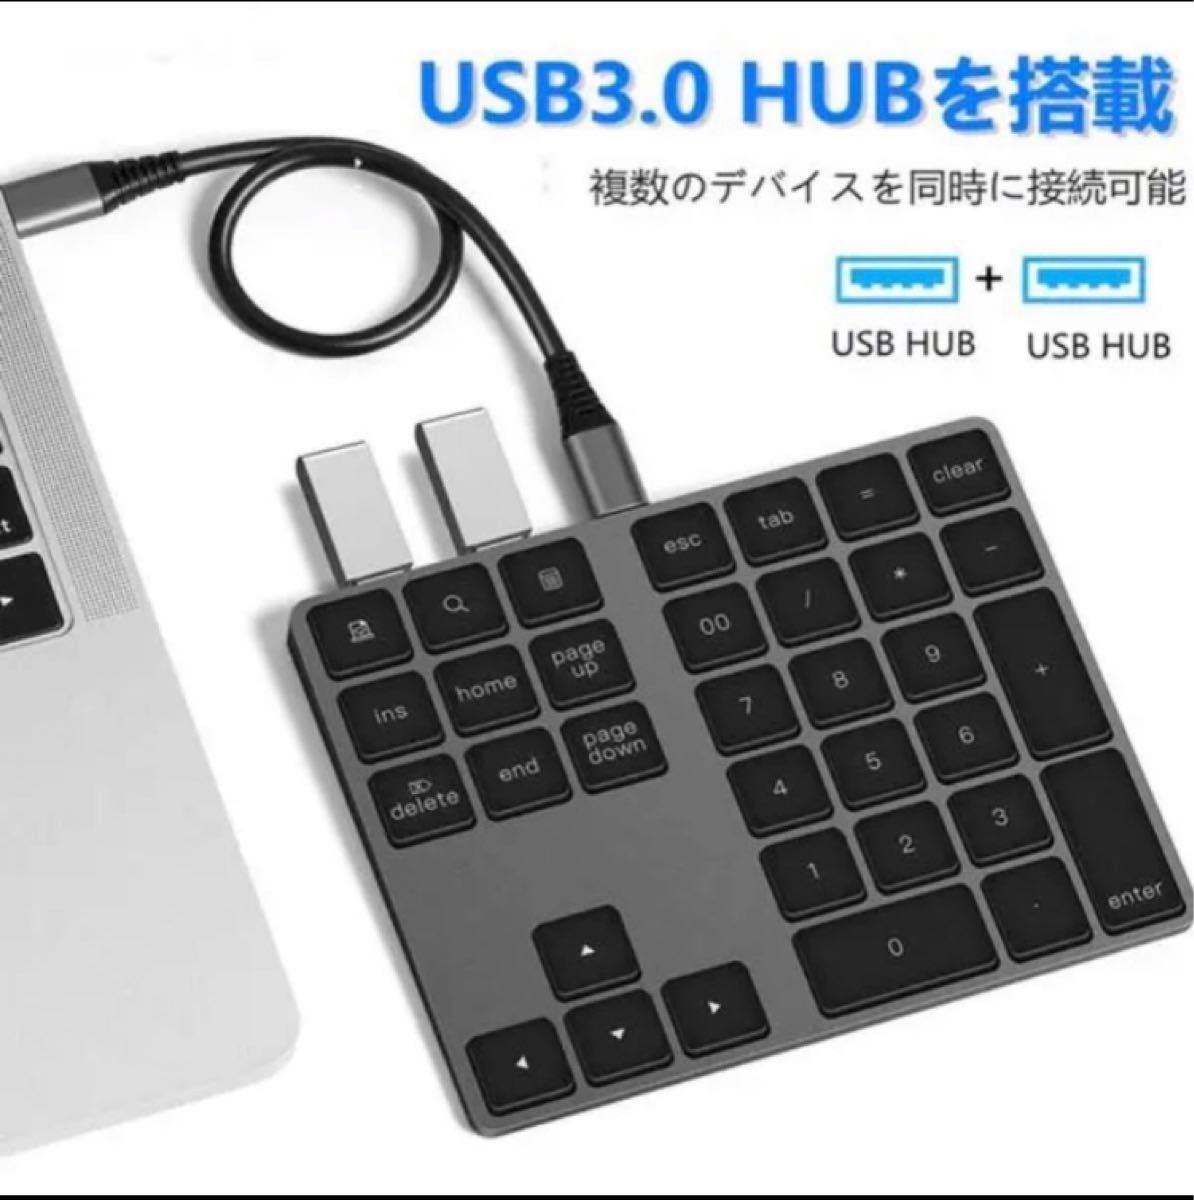 Bluetoothテンキー ワイヤレス 2ポートUSB3.0